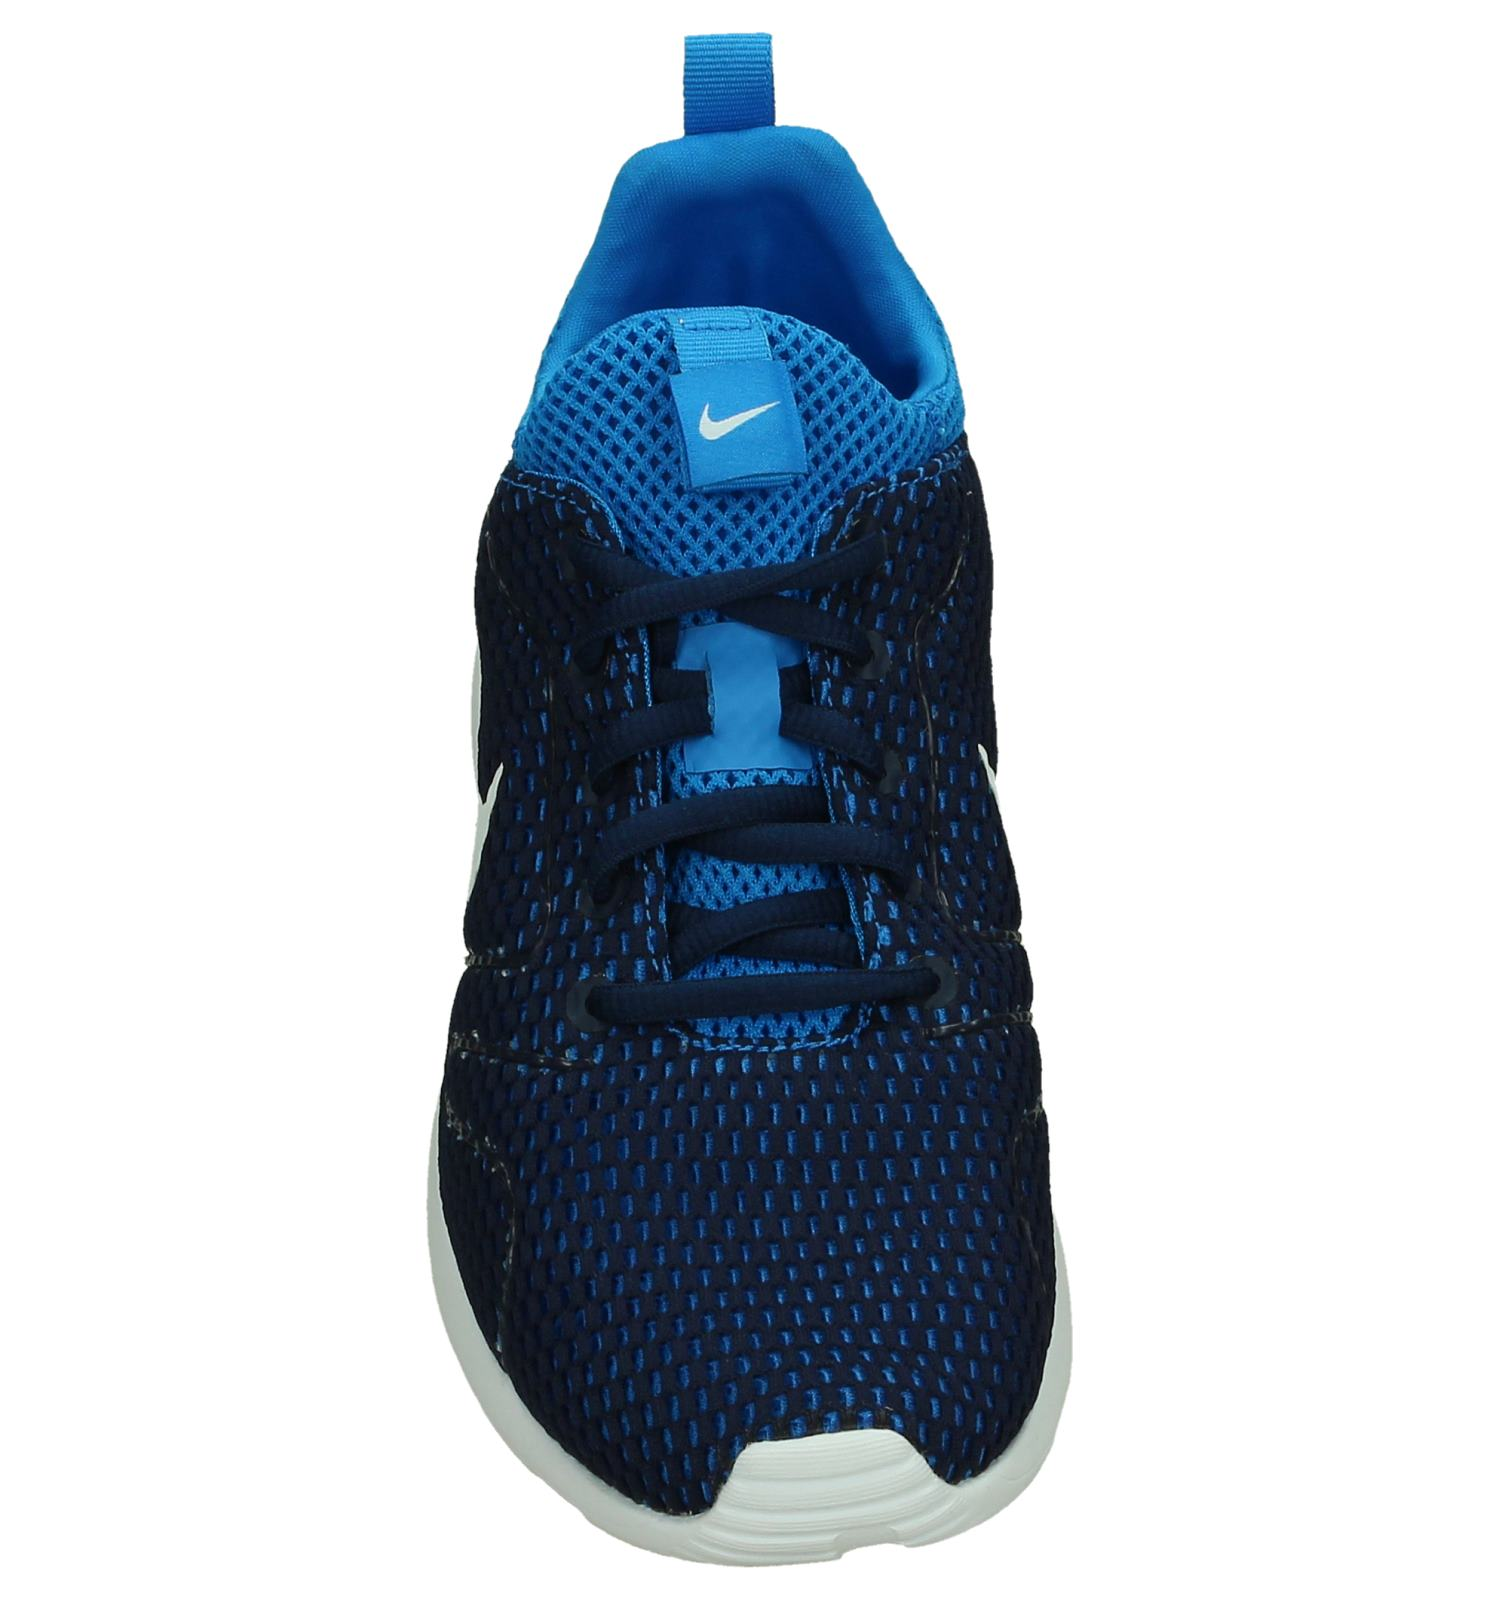 new style b1fa4 3ed34 Blauwe Lage Sportieve Sneakers Nike Kaishi  TORFS.BE  Gratis verzend en  retour